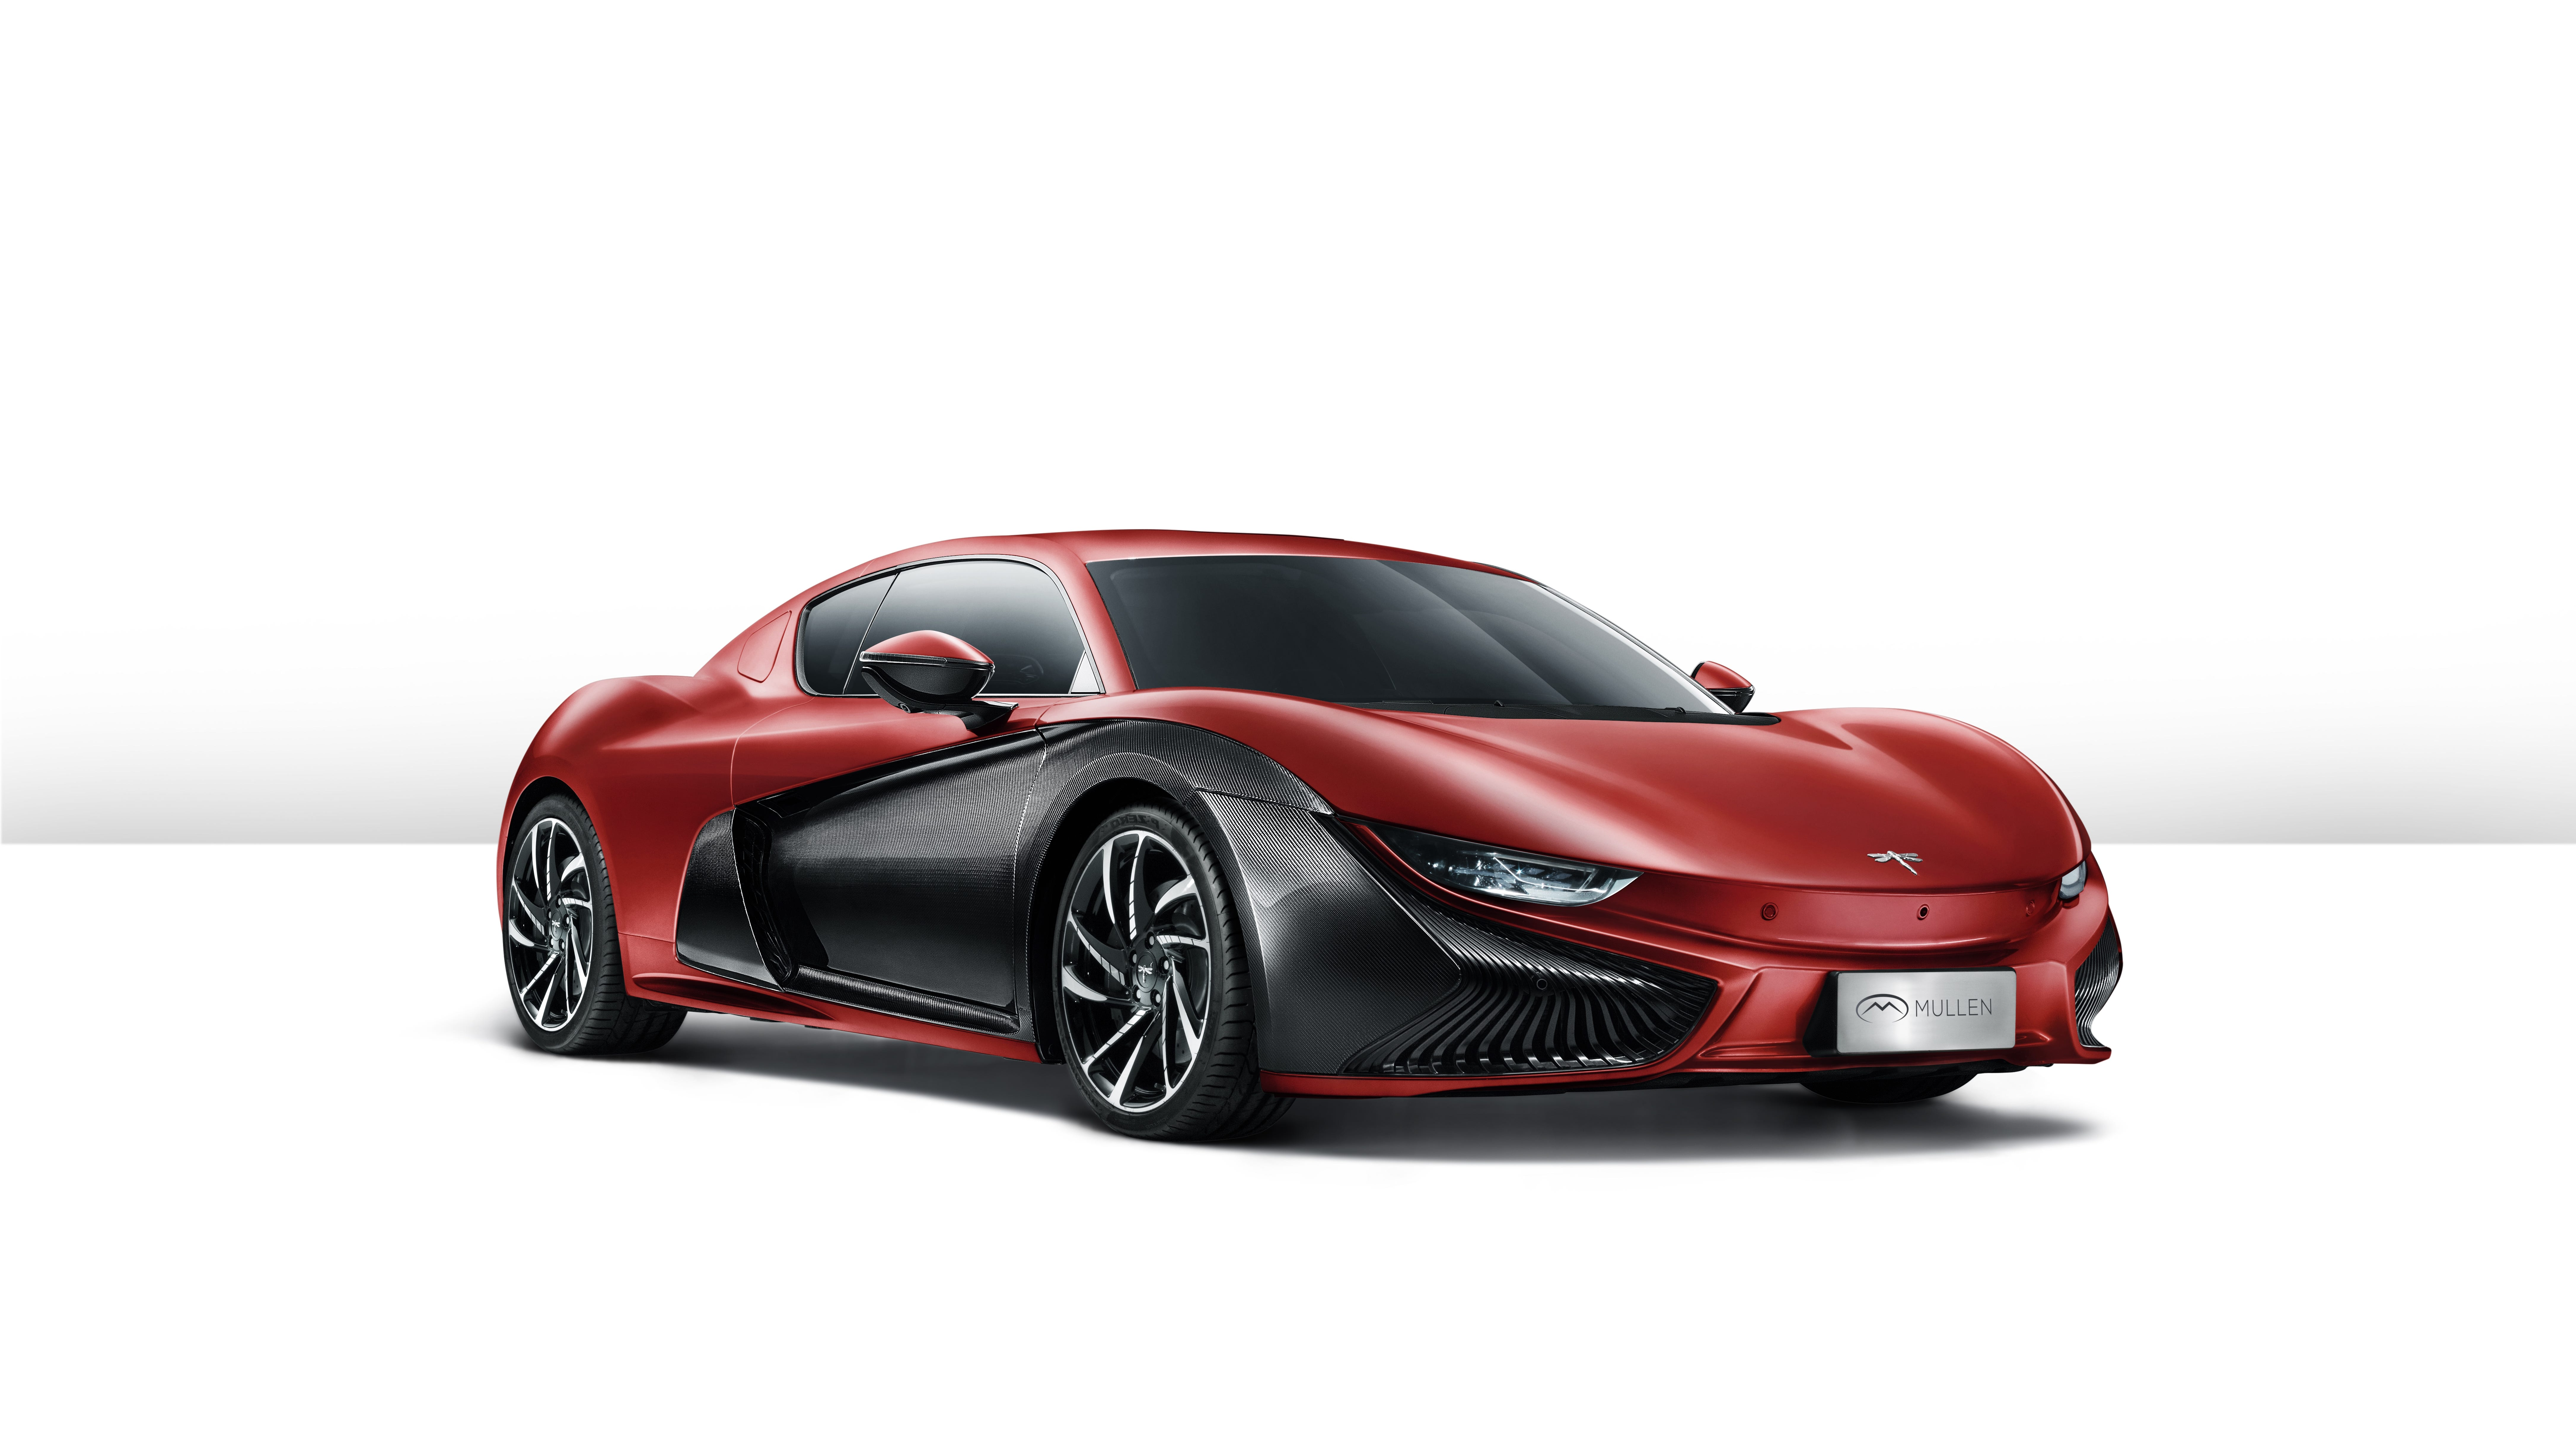 Chinese Qiantu electric supercar targets U.S. market